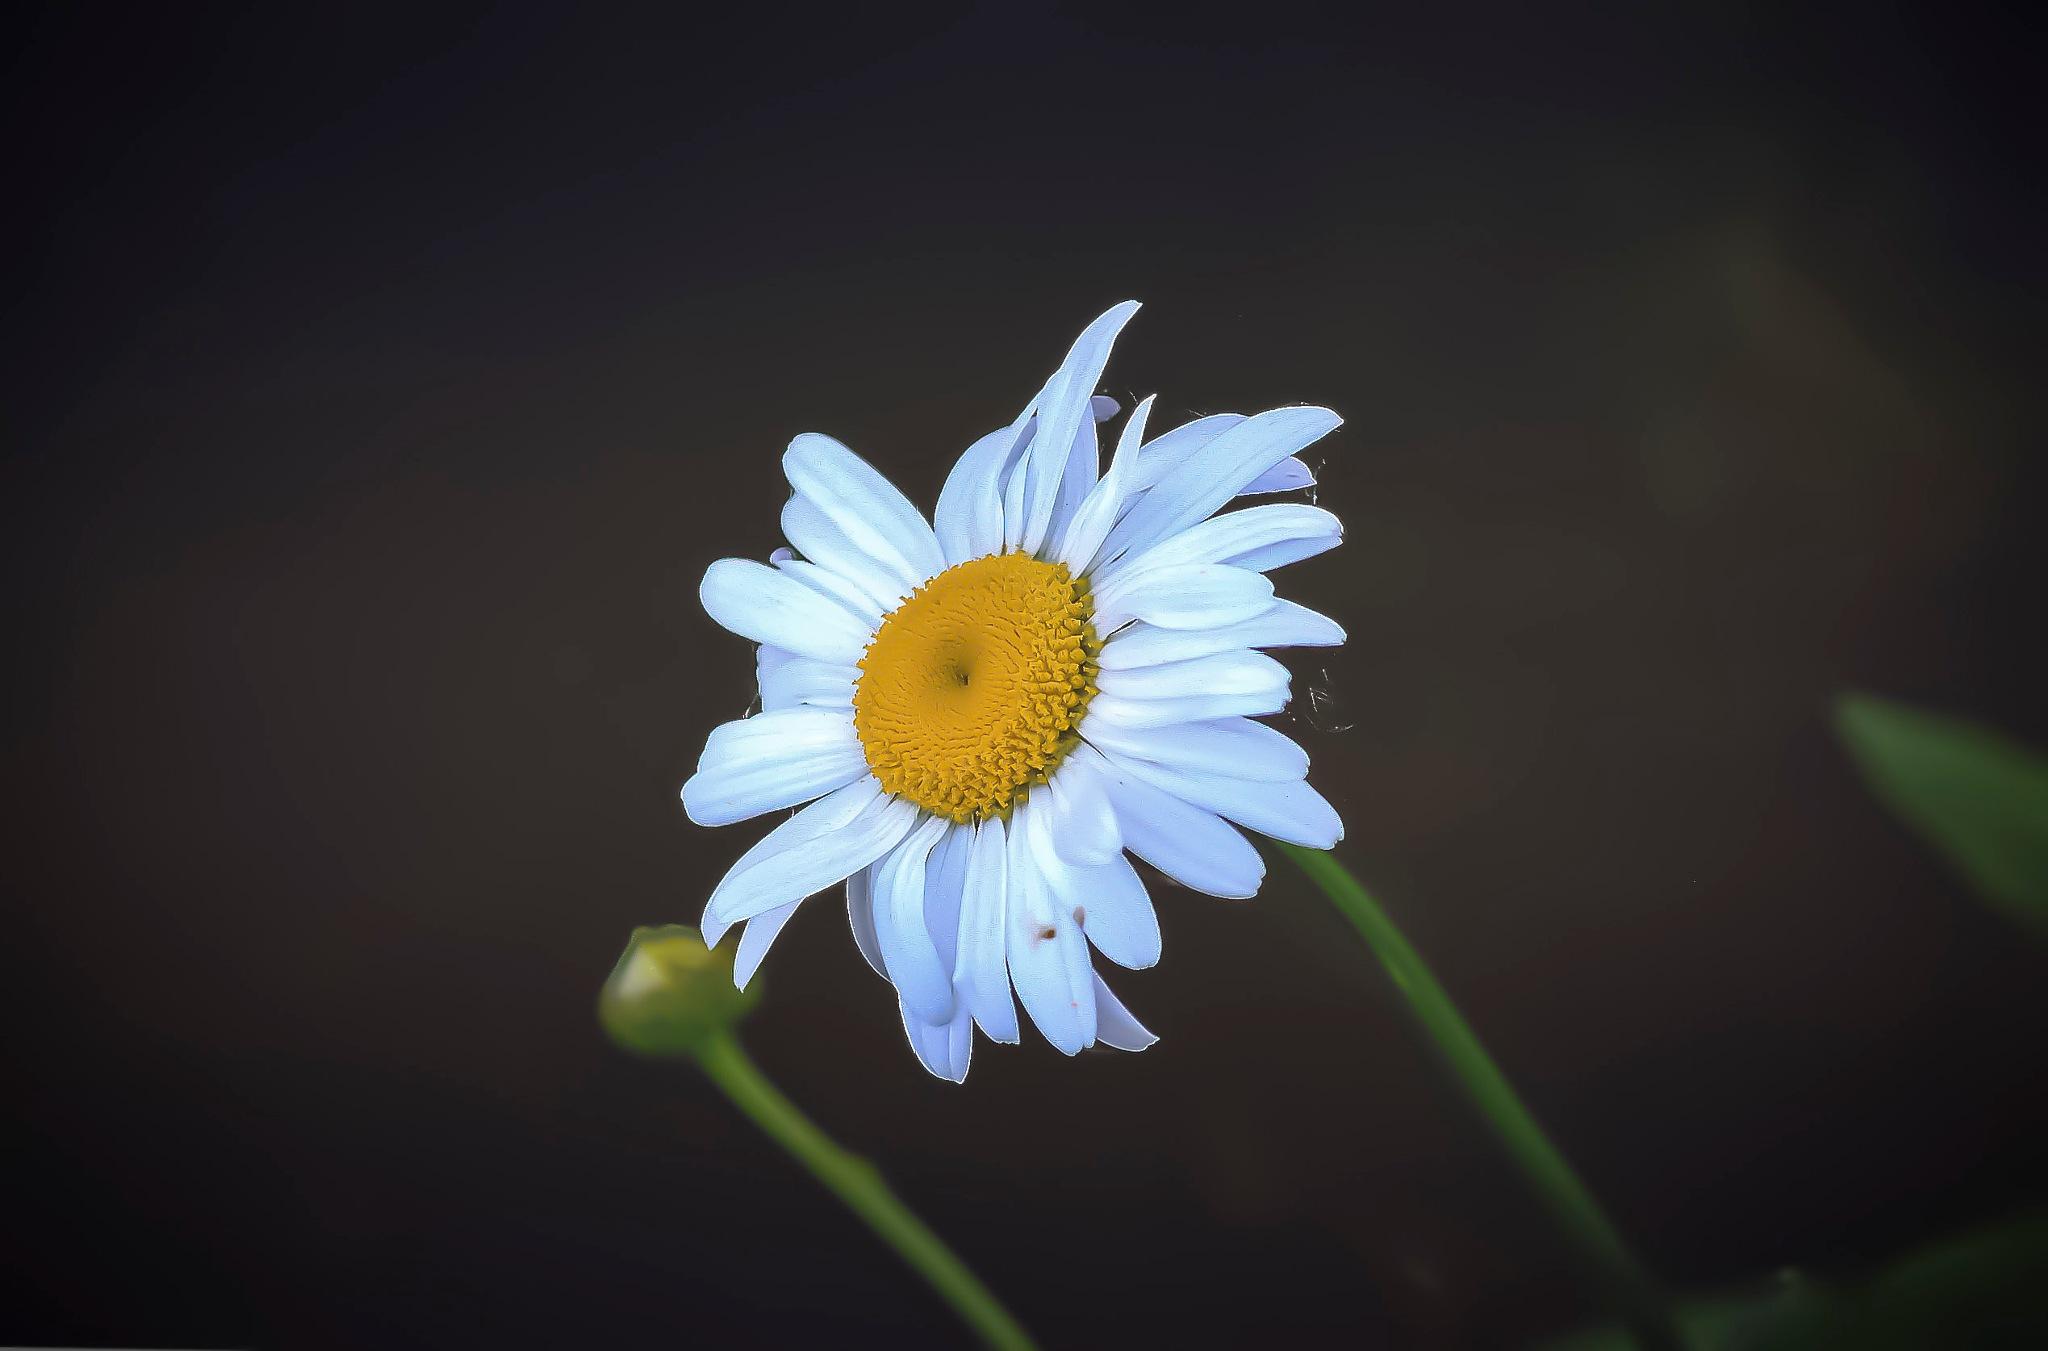 tiny little flower by Cesare Vatrano